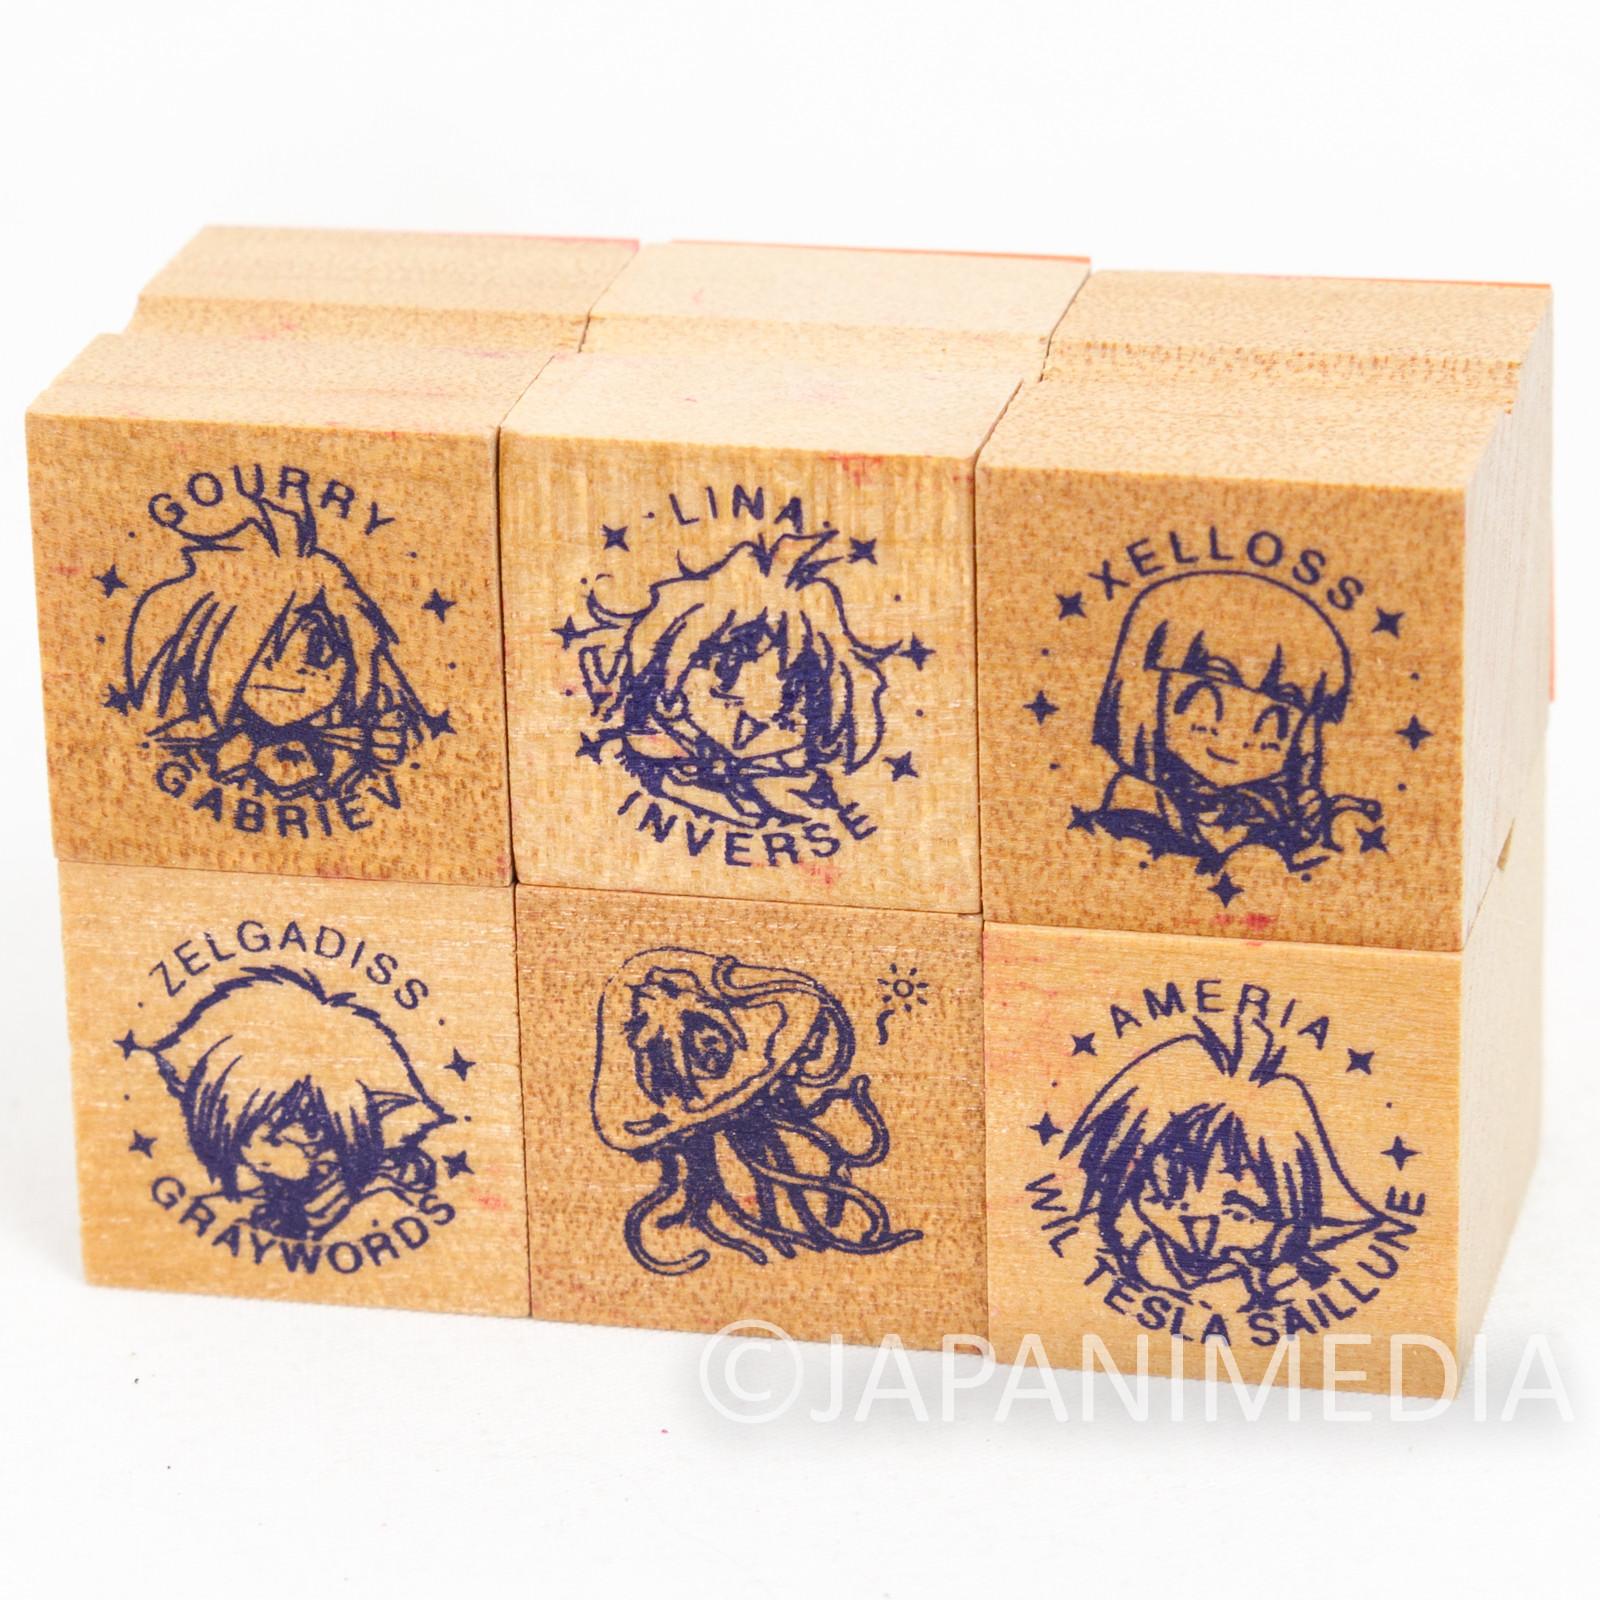 Slayers NEXT Mini Stamp 6pc Set [ Lina | Gourry | Ameria | Zelloss | Zelgagiss ]